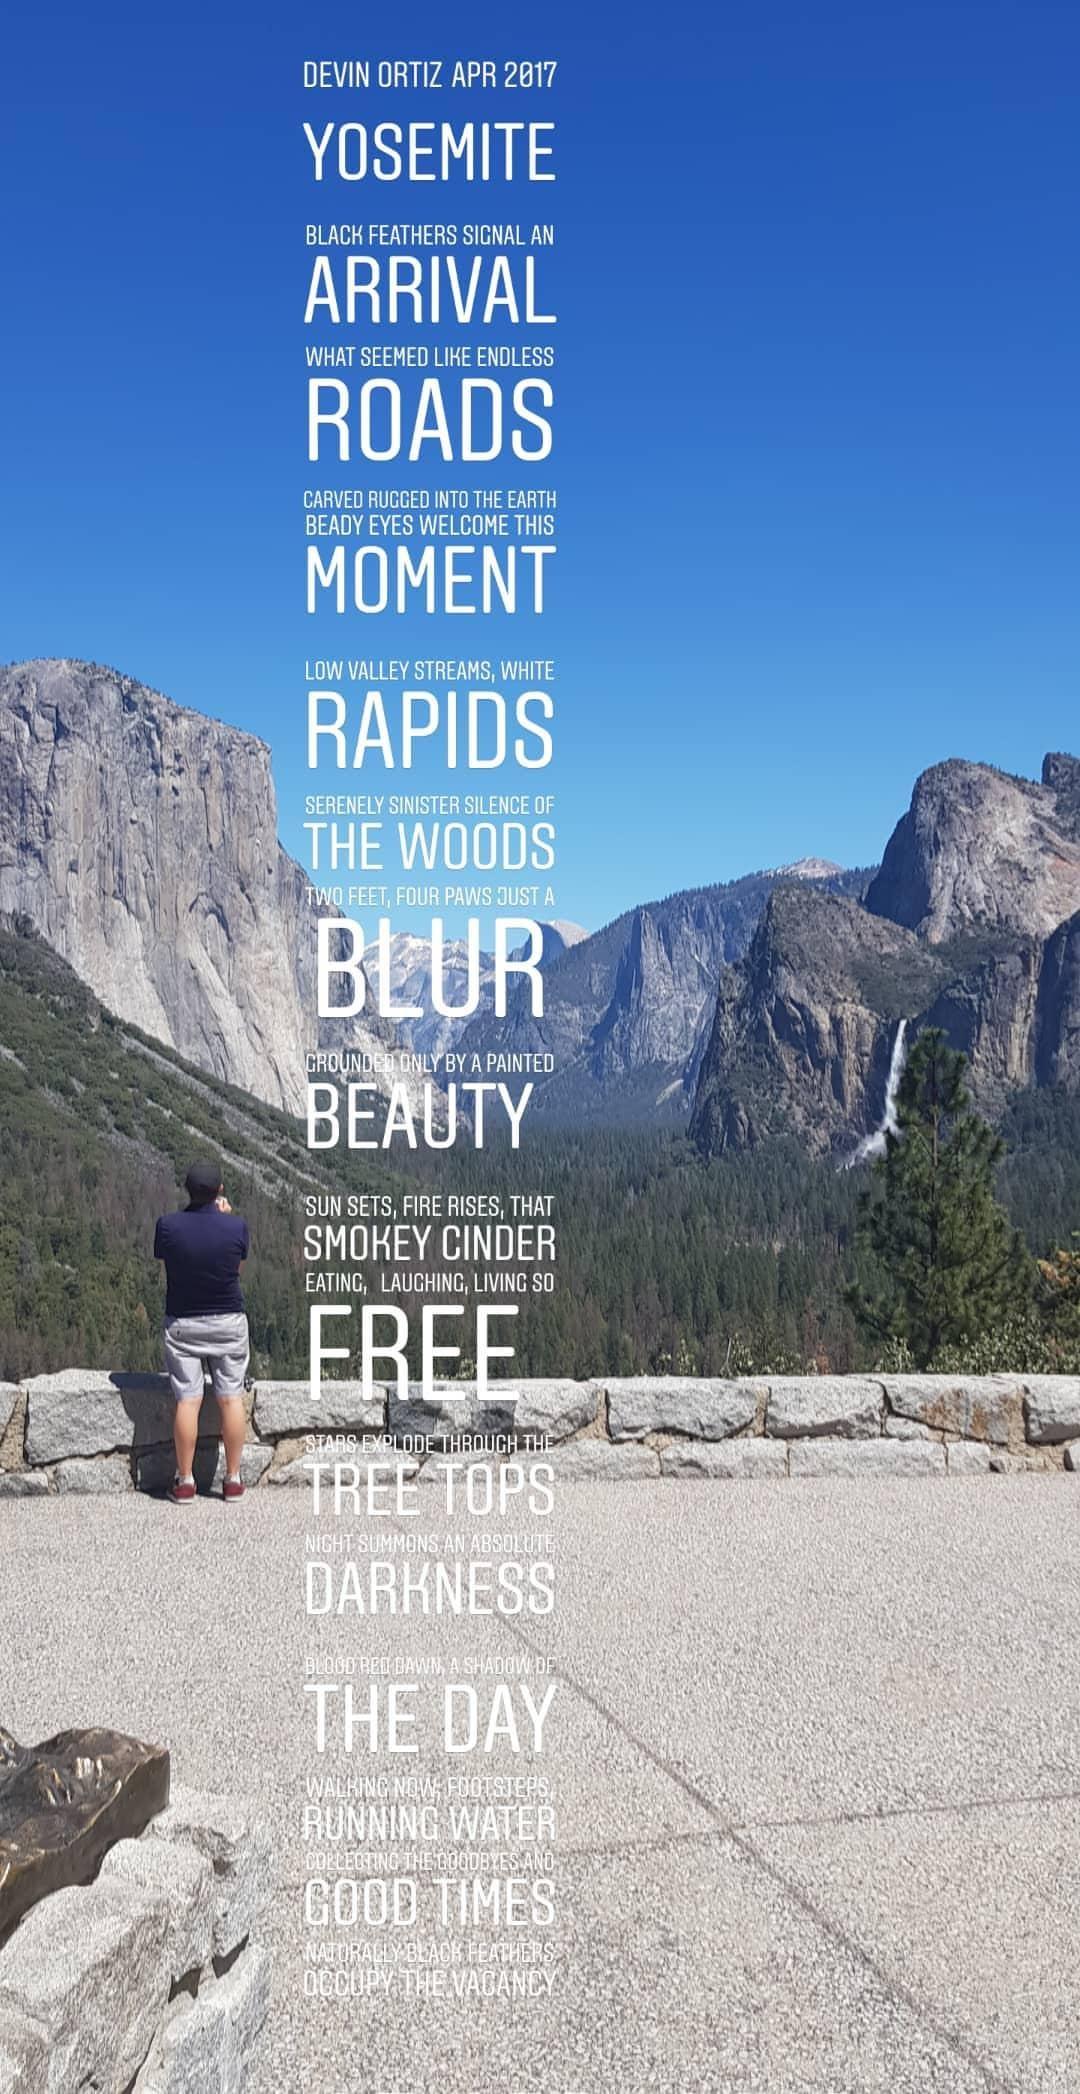 yosemite national park exploring waterfall view usa road trip travel vlogger